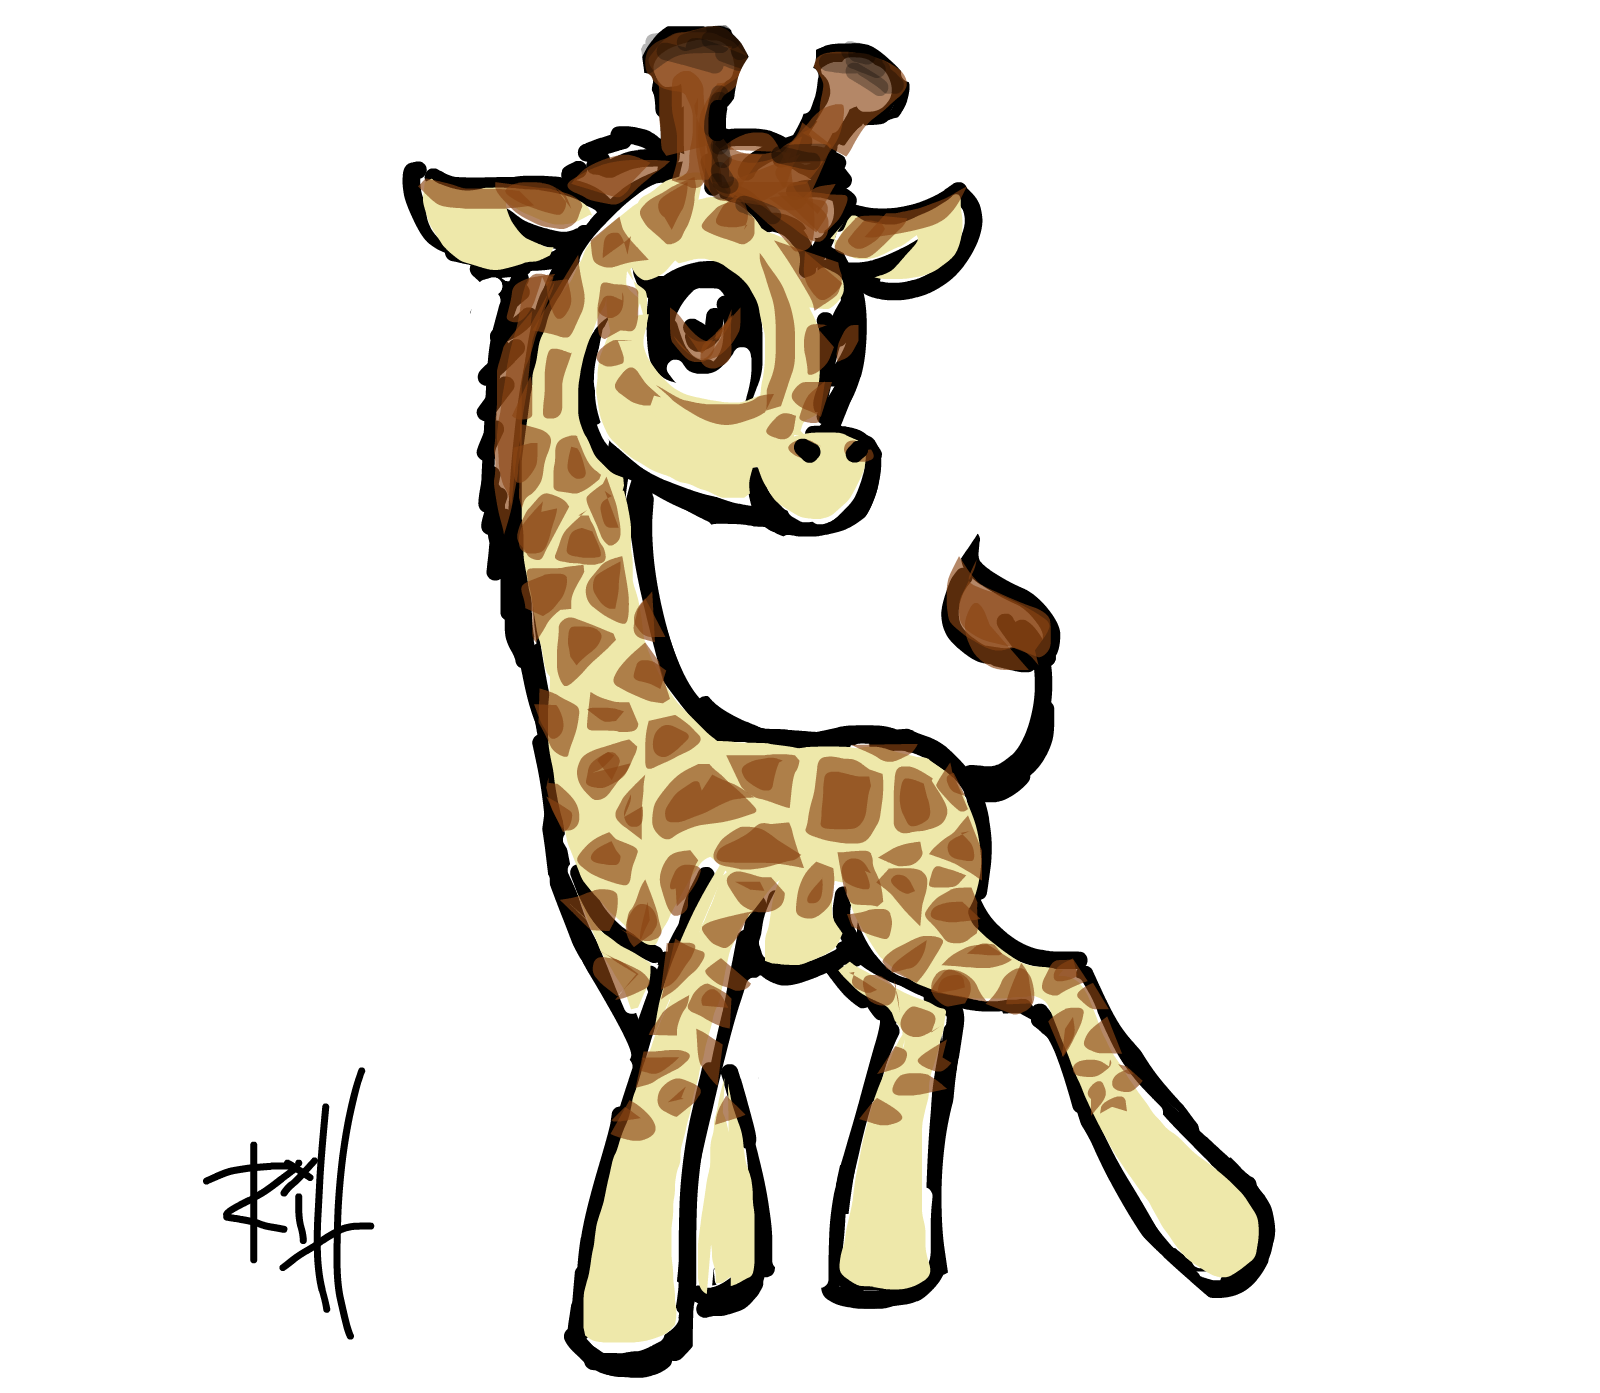 Drawings of cute giraffes for Giraffe draw something